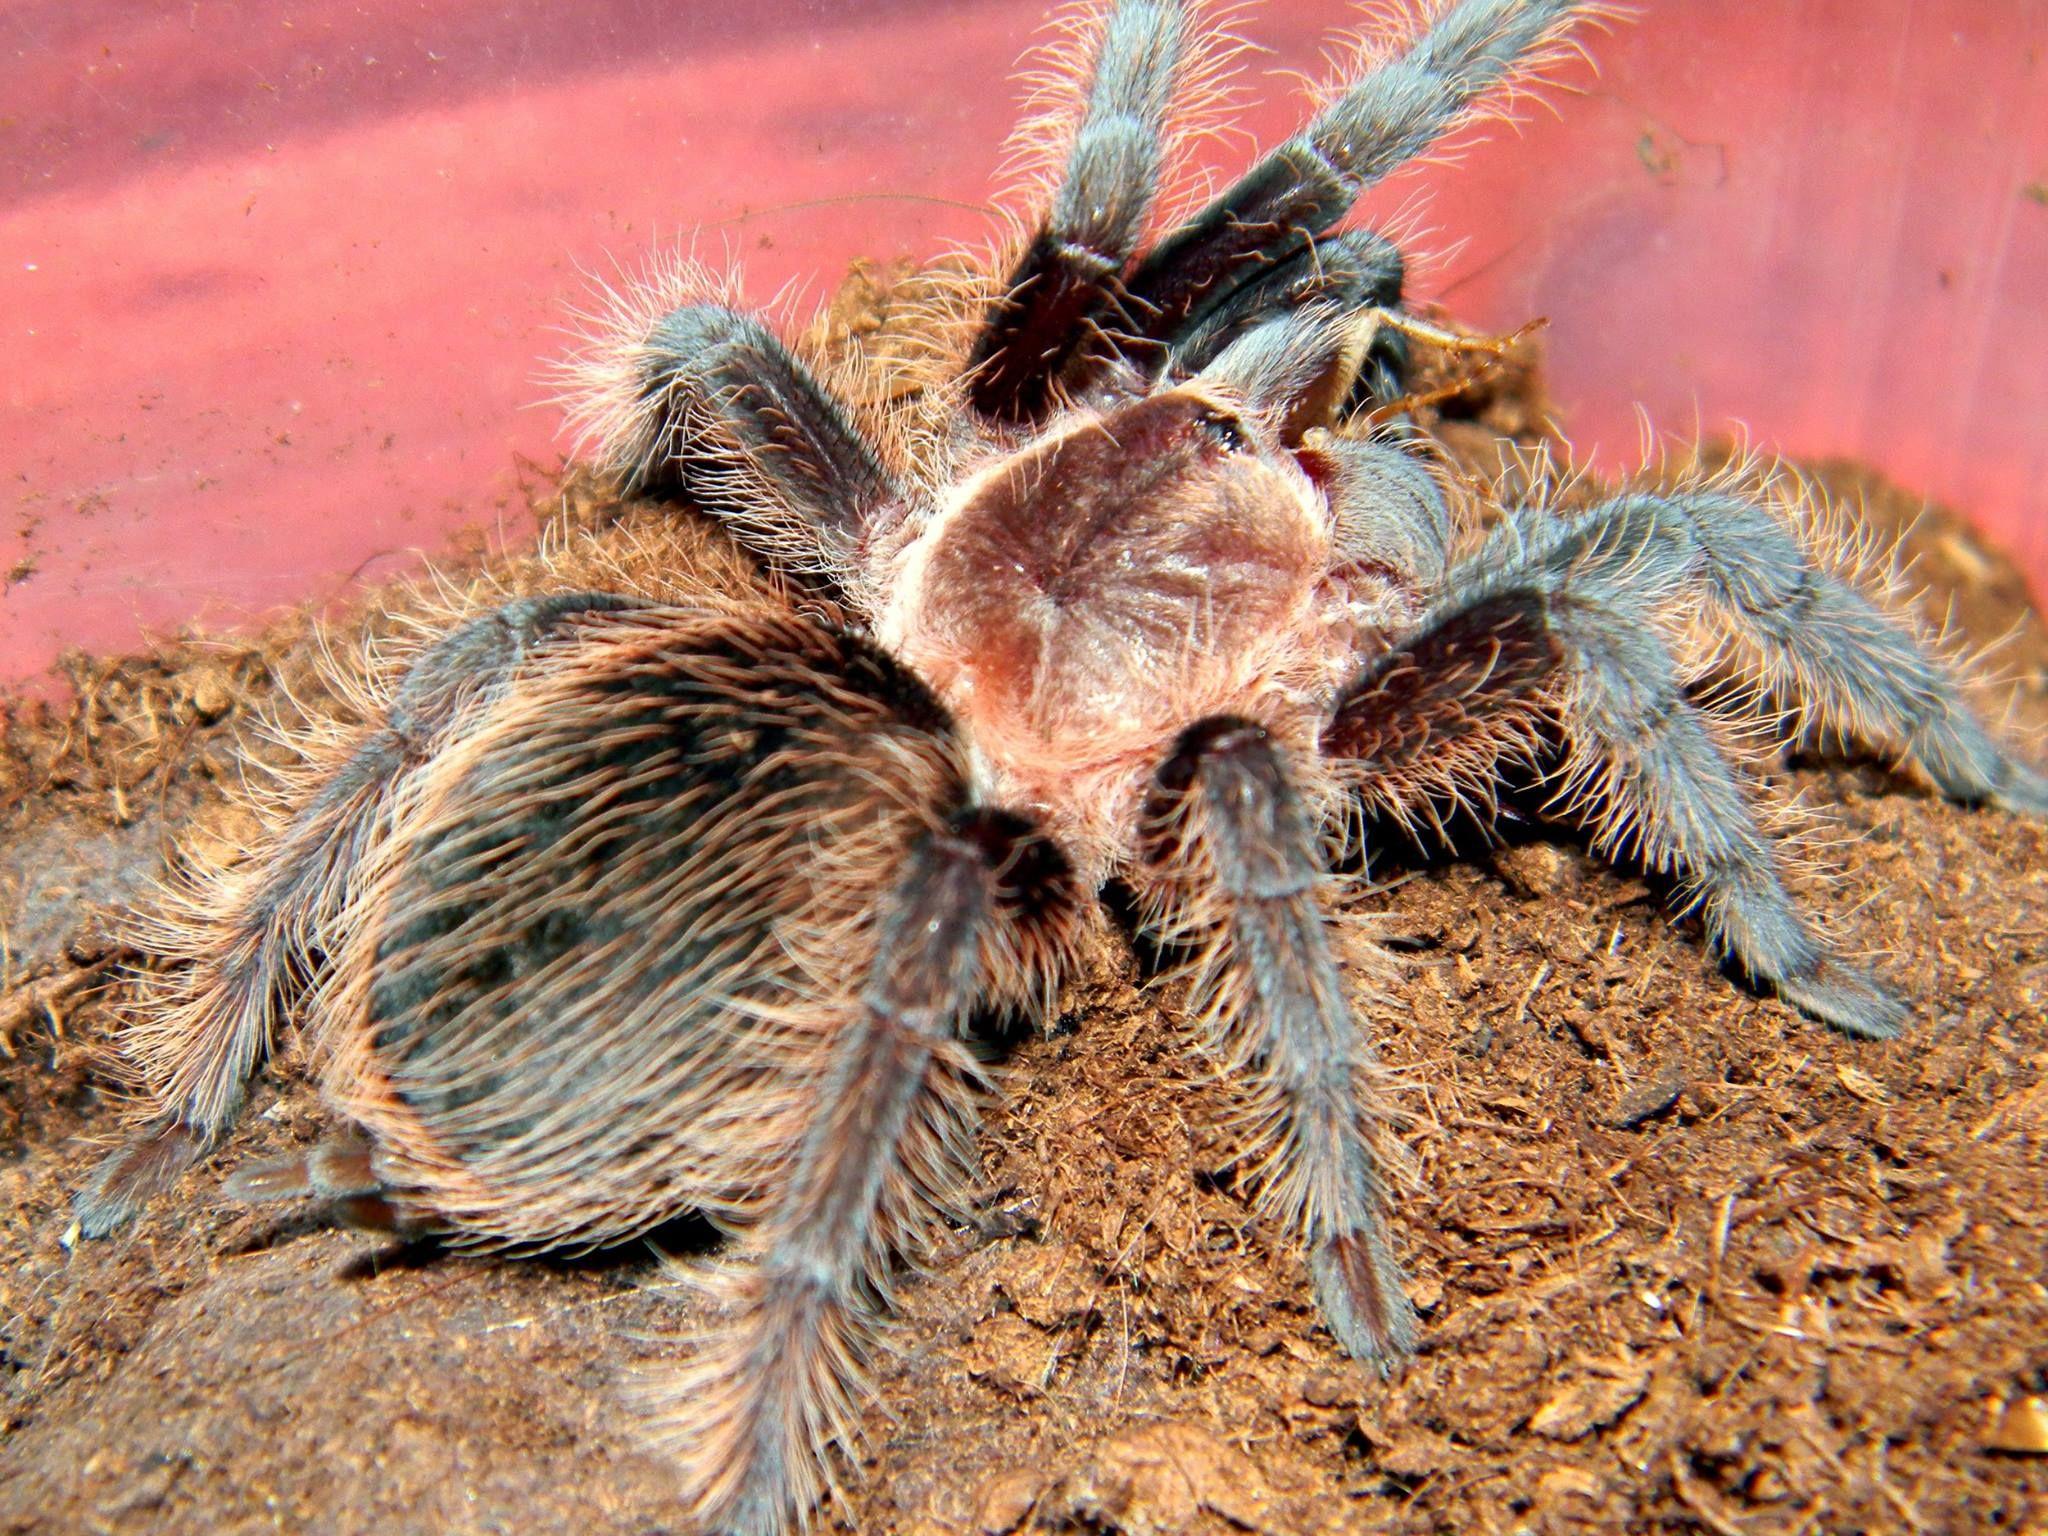 B Albopilosum Tier Fakten Vogelspinnen Spassfakten